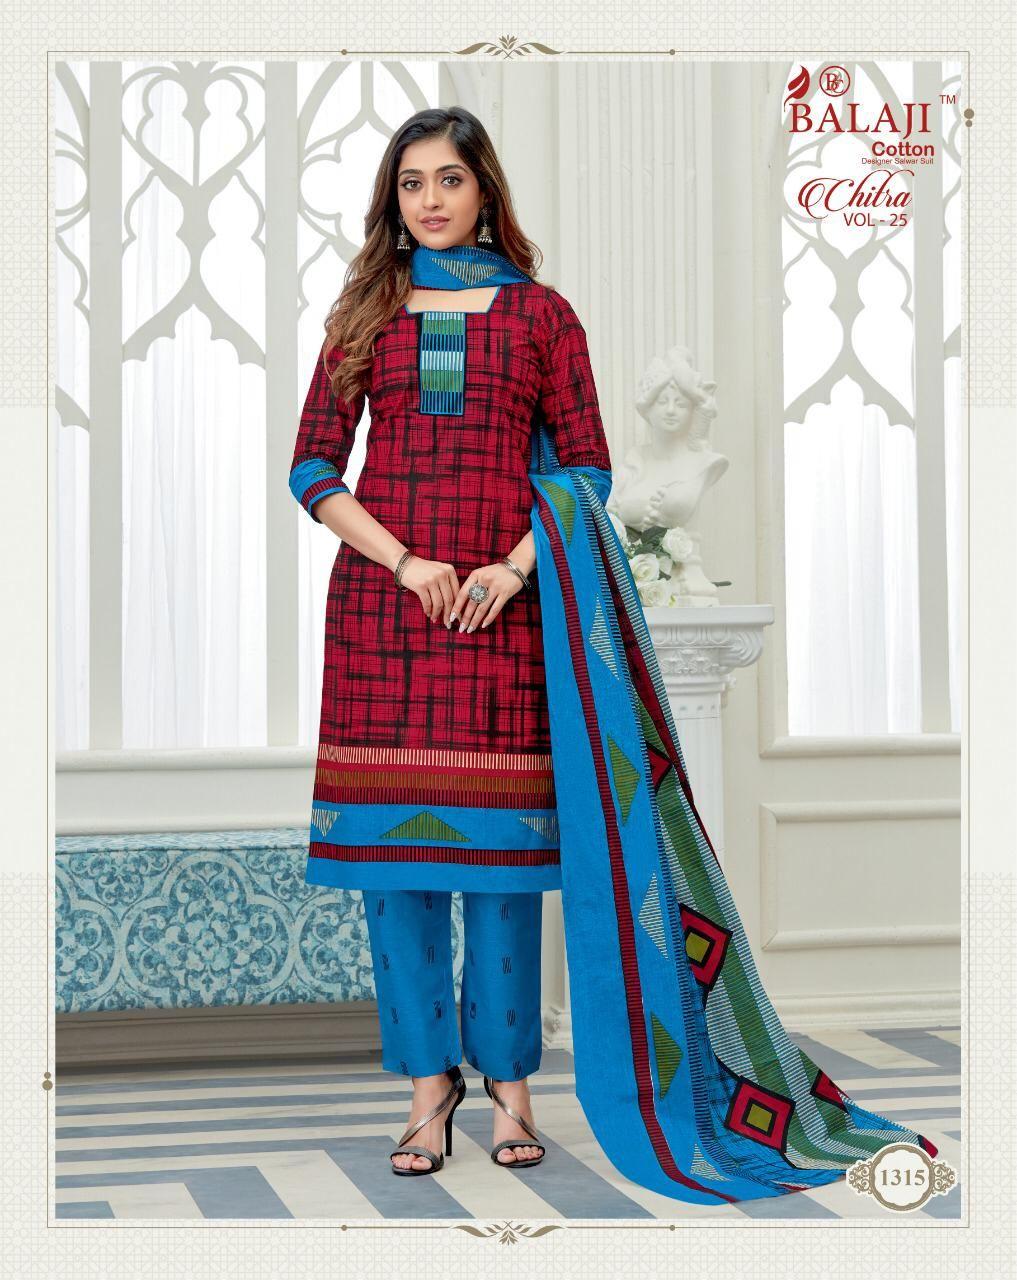 Balaji-Chitra-Vol-25-15